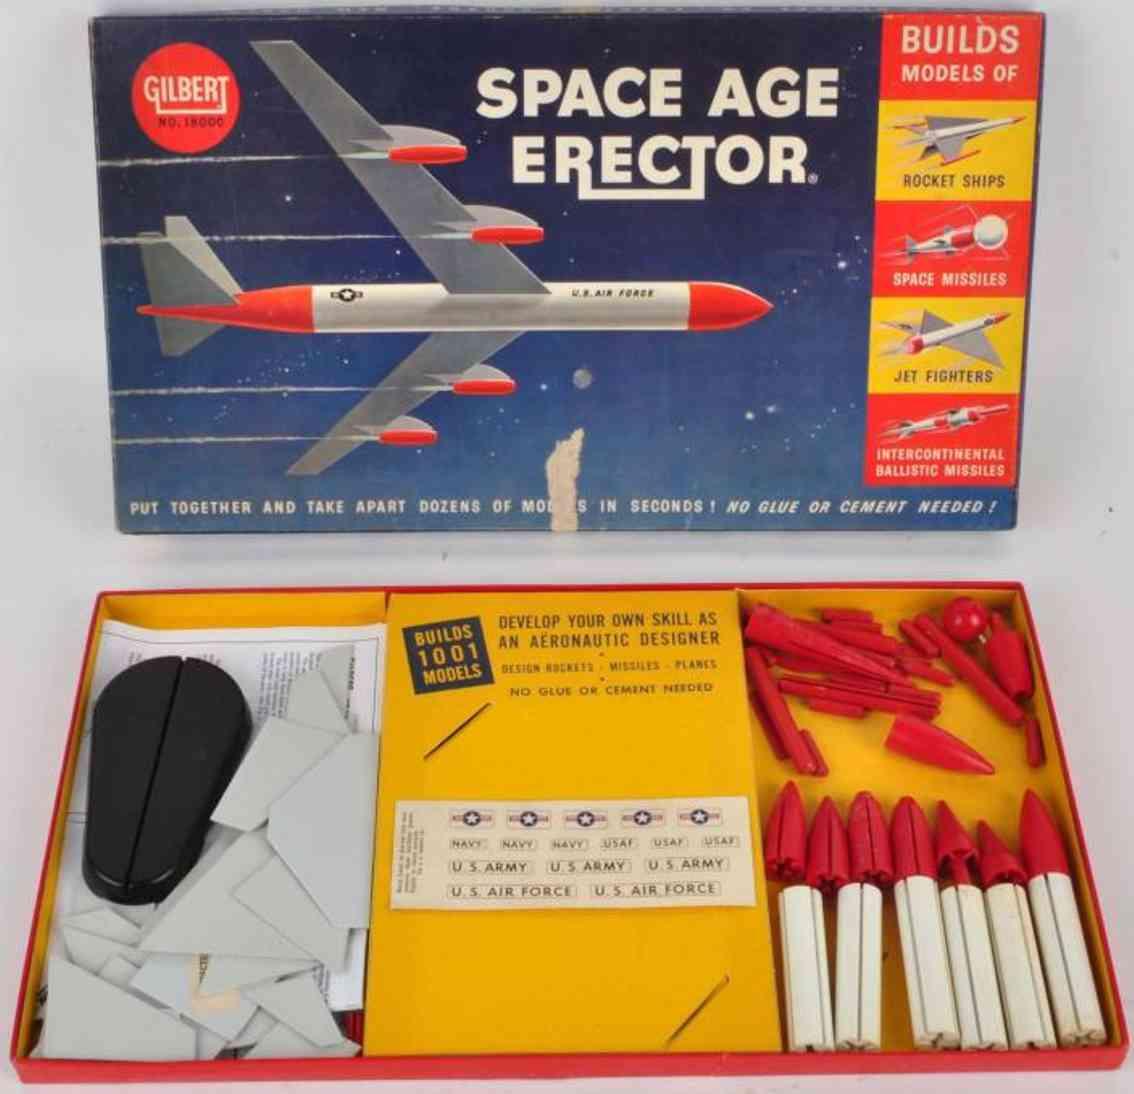 gilbert 1800 metal kit space age erector set